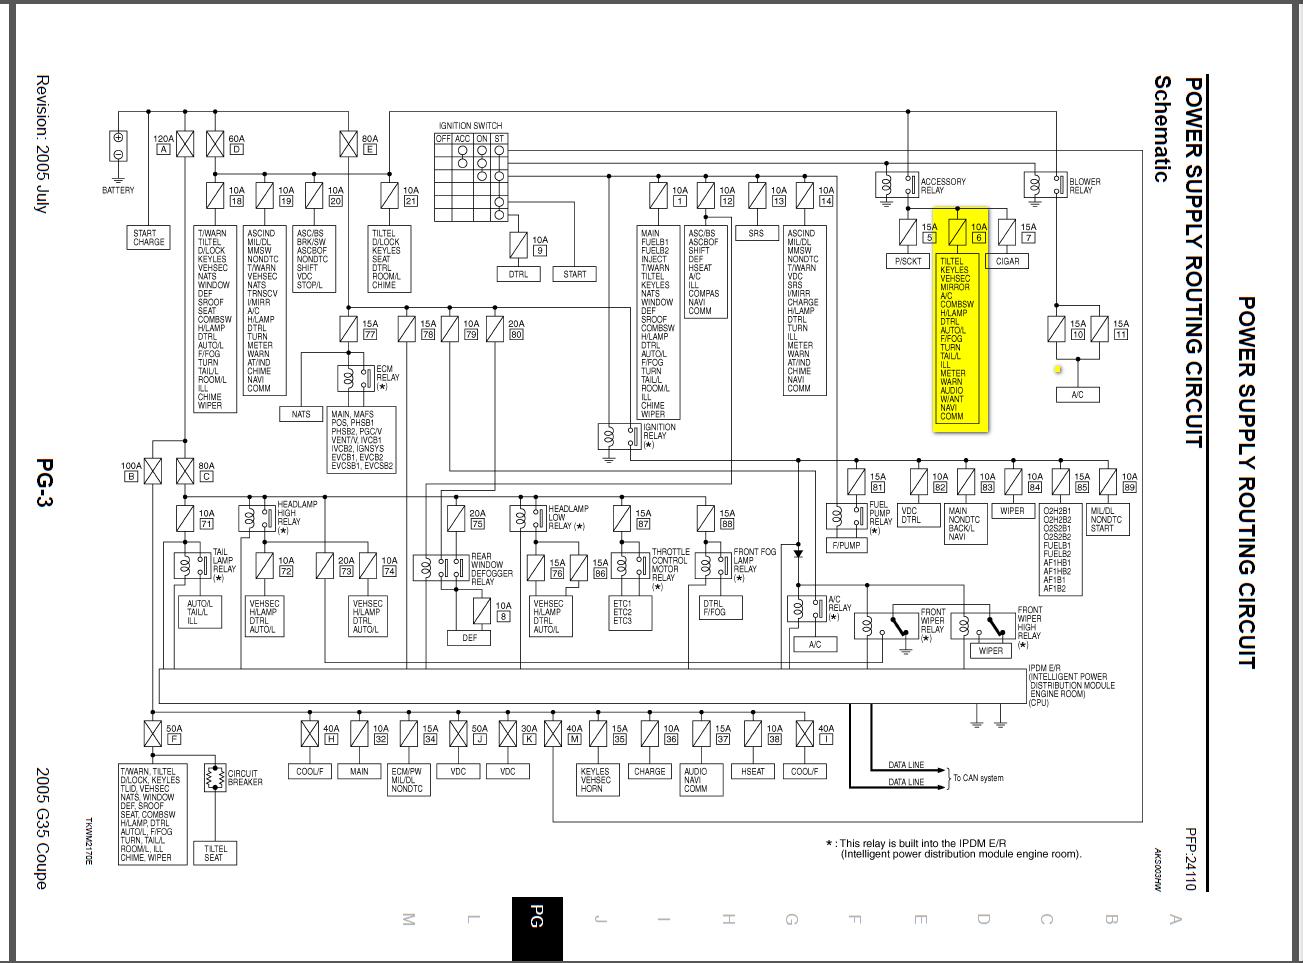 ot_6922] 2006 nissan maxima speaker wiring diagram moreover 1999 nissan maxima  schematic wiring  adit sapebe mohammedshrine librar wiring 101